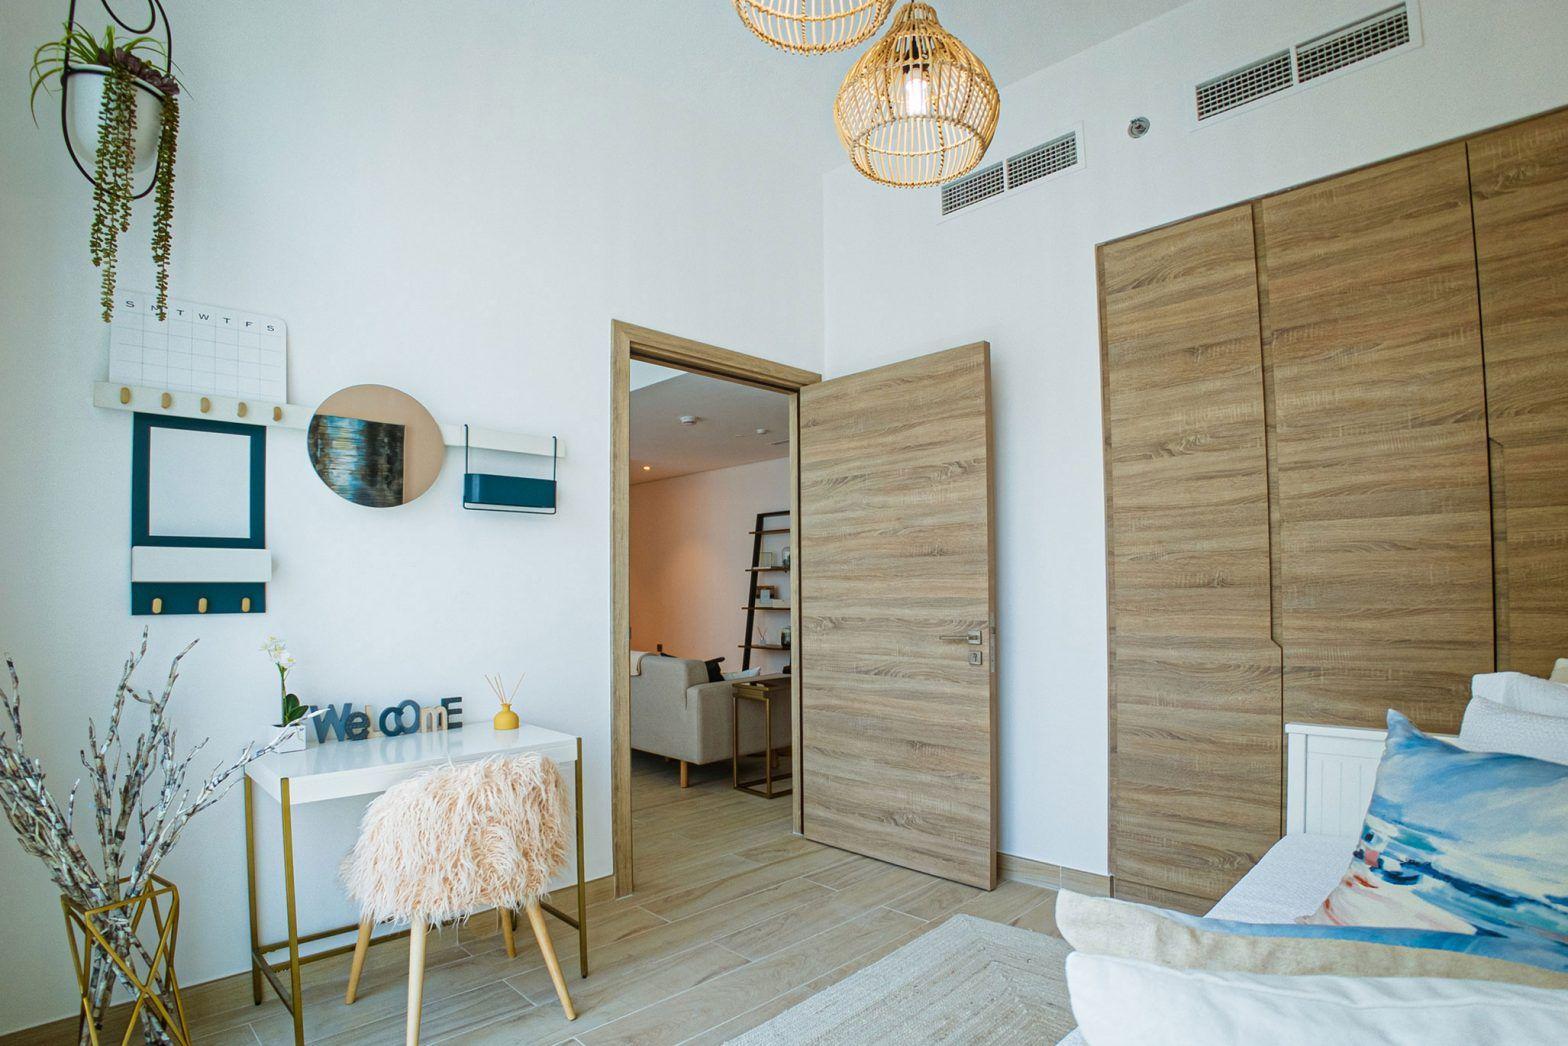 1 Bedroom Apartment Studio One 1 Bedroom Apartment Apartment Garden Apartment